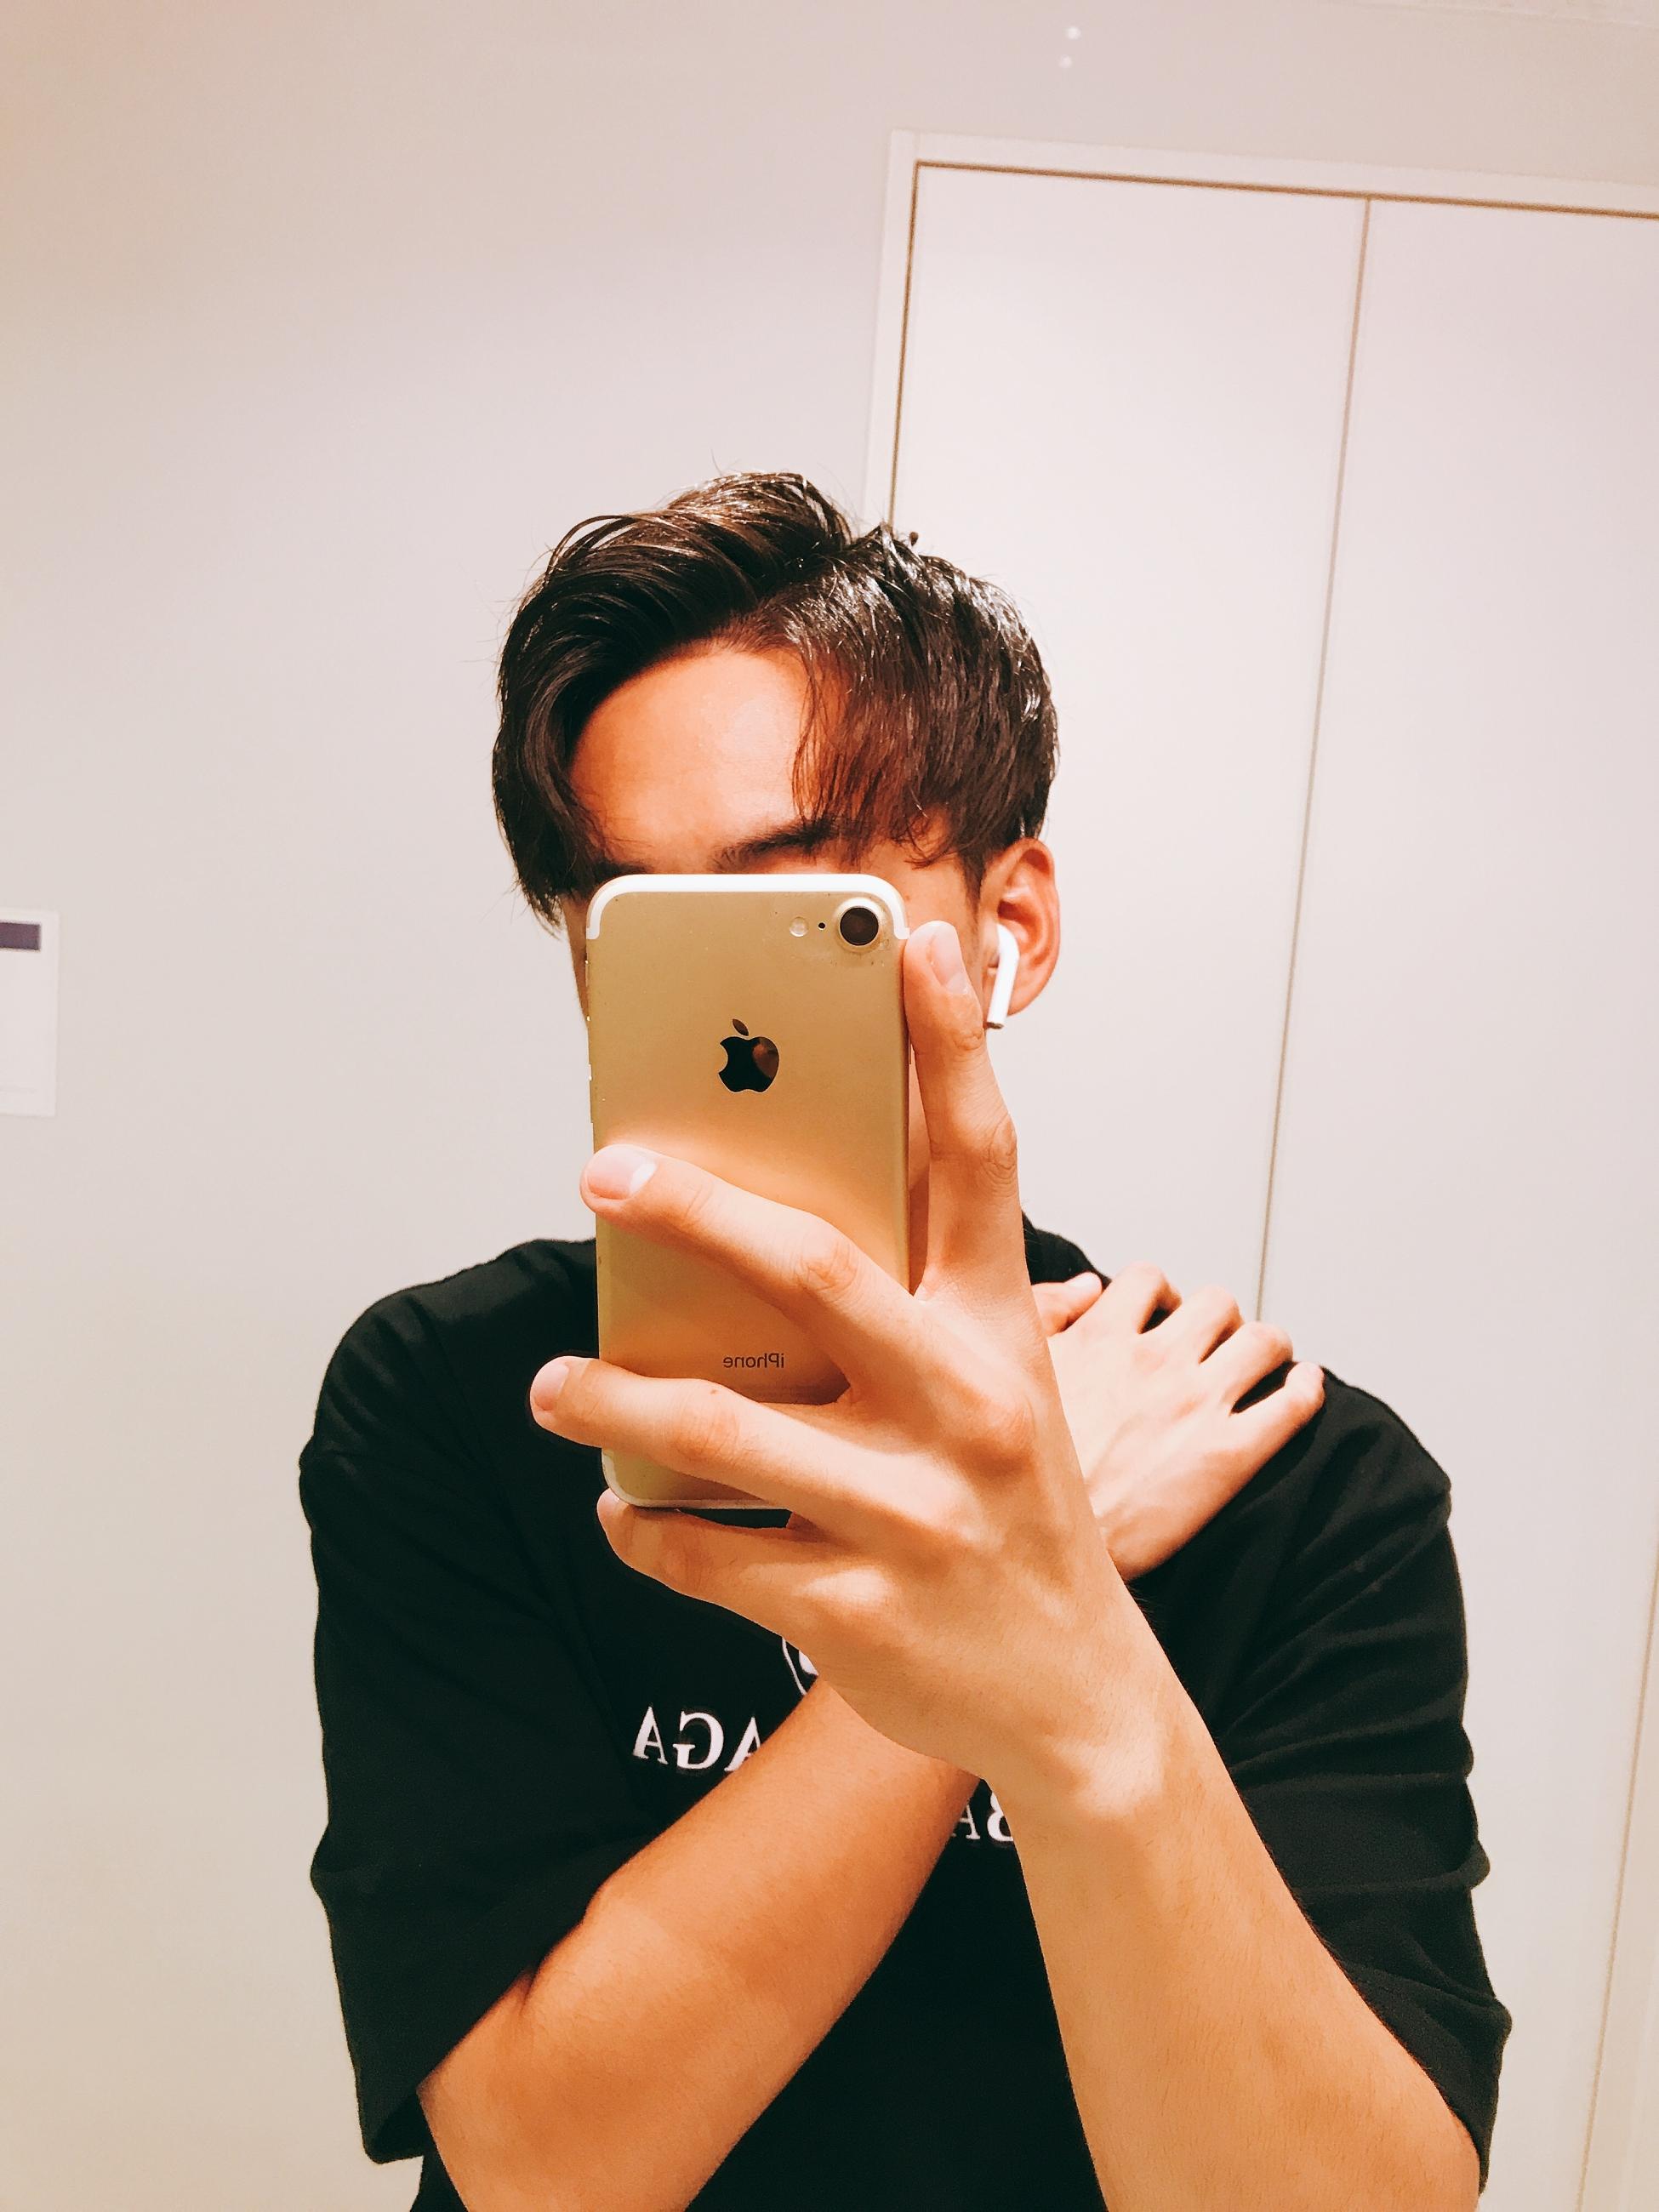 SYOKI(ショウキ) ☆前髪上げSTYLE☆